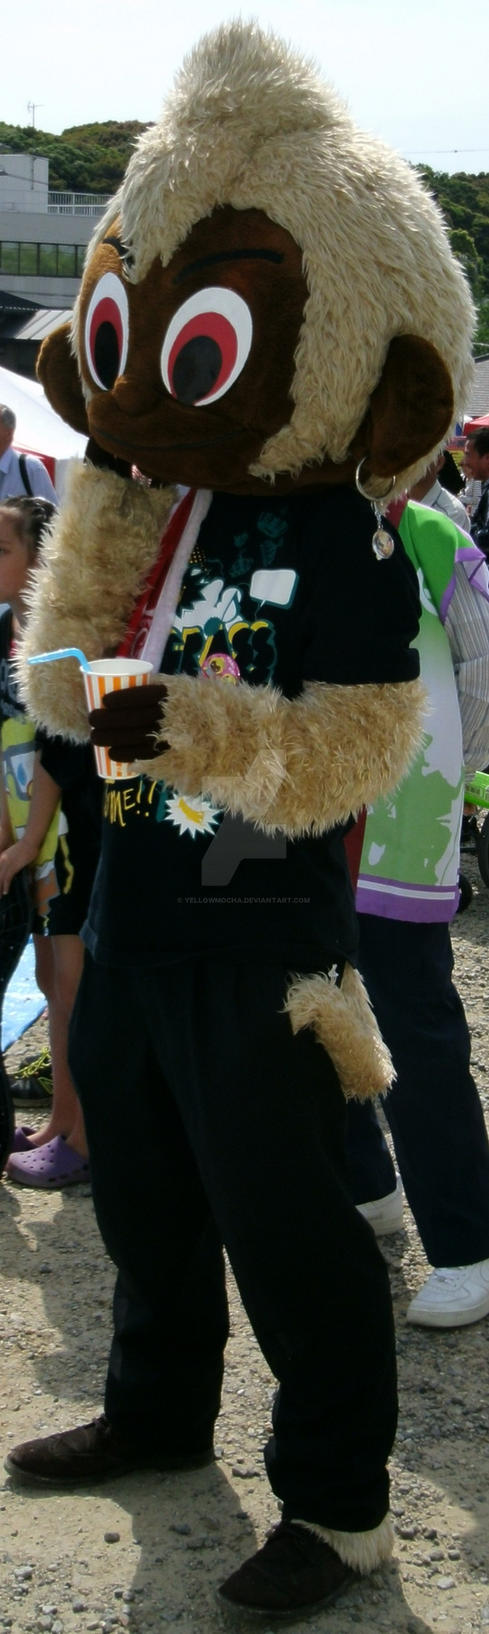 Osaru no Kuu (costume 3) 18 by yellowmocha